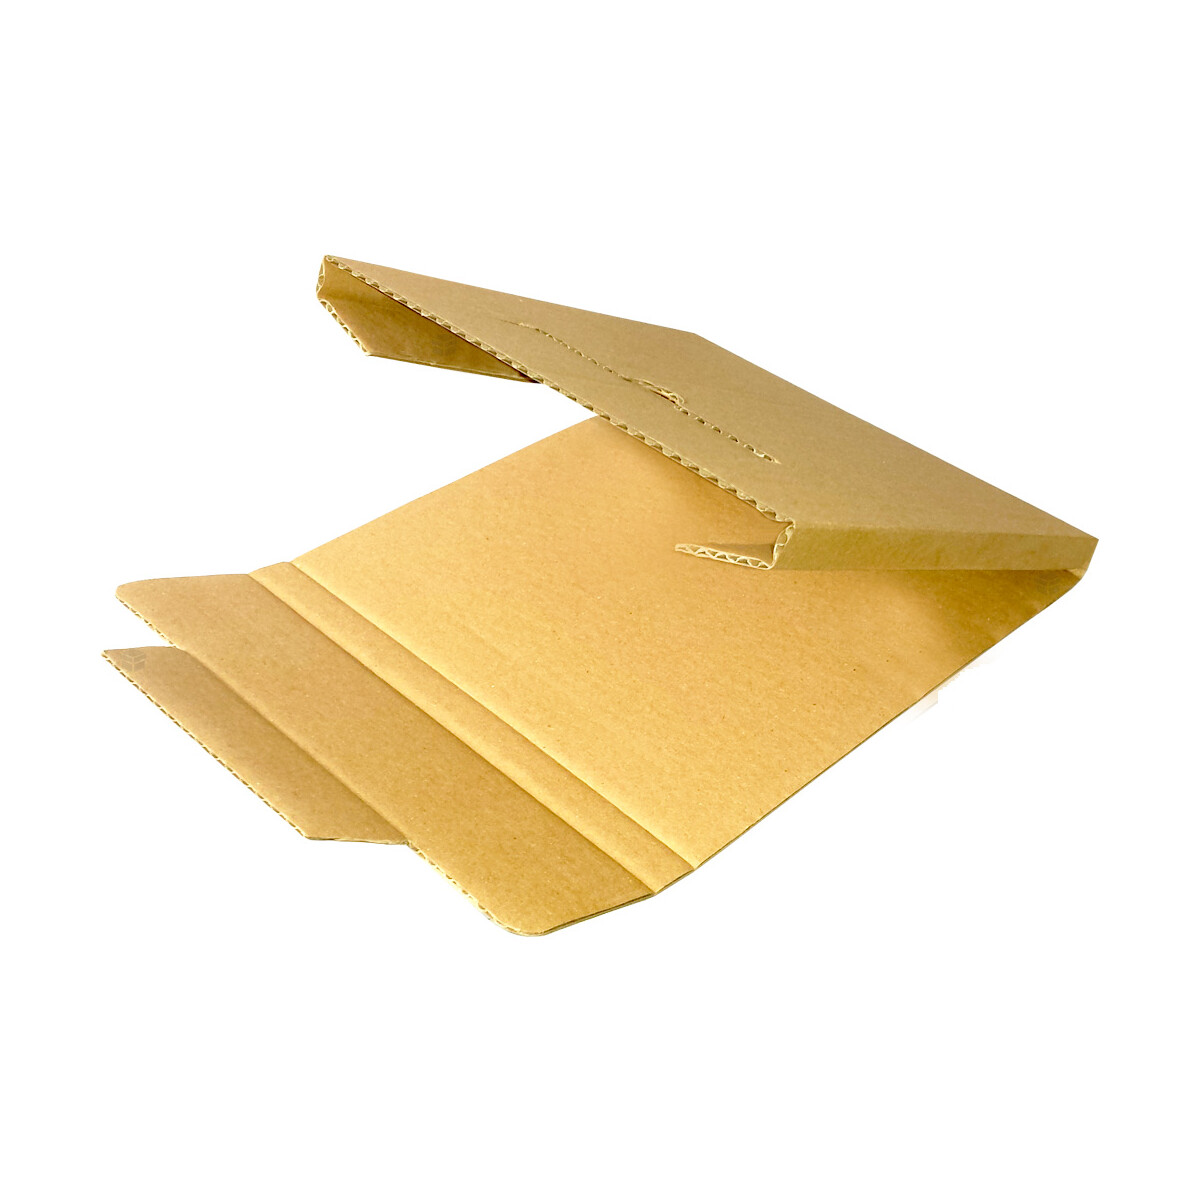 LP//CD Karton 185 x185 x10 mm Verpackung